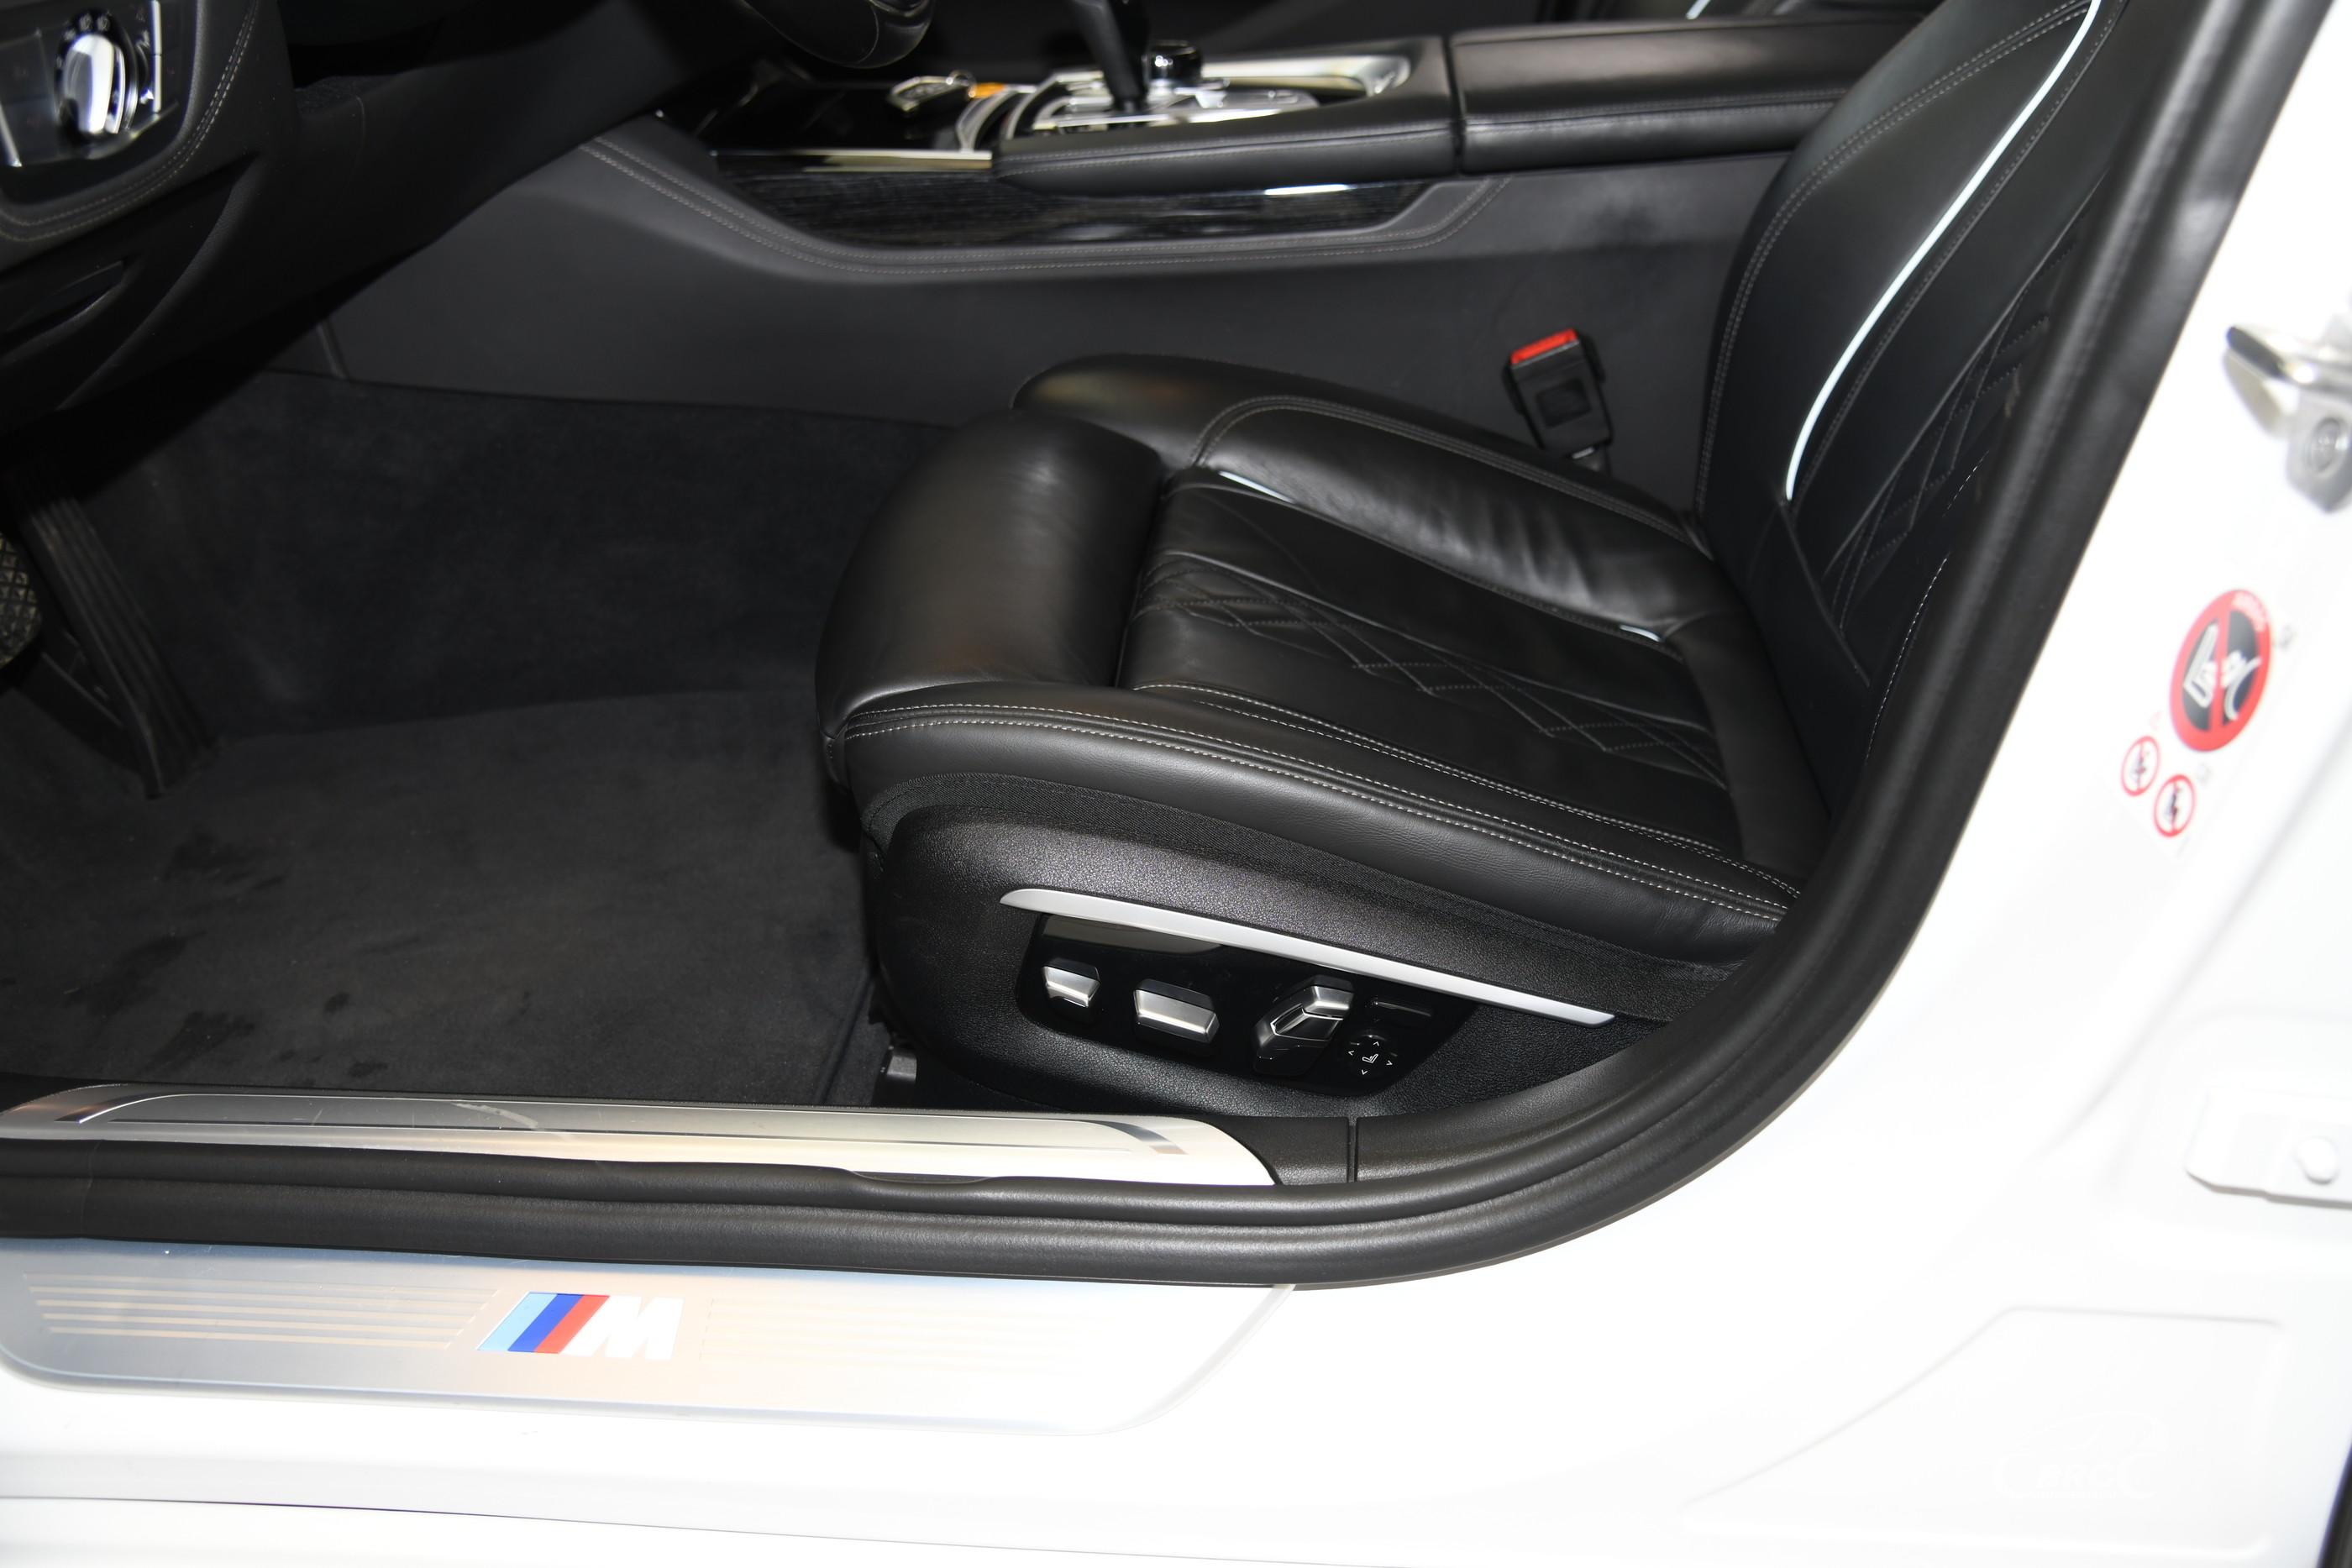 BMW 730 d Xdrive M-packet Automatas